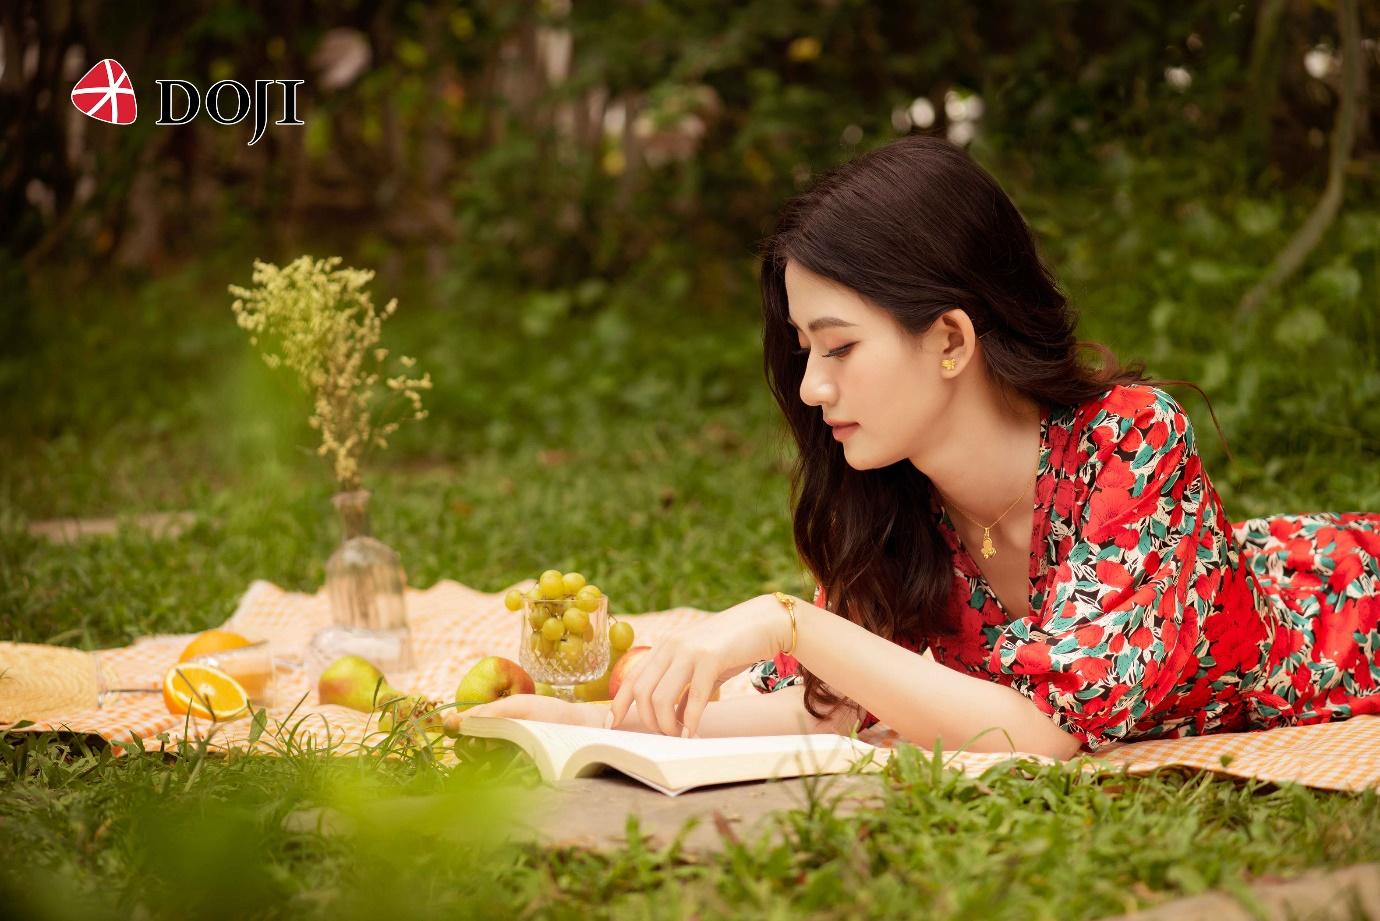 A person reading a book  Description automatically generated